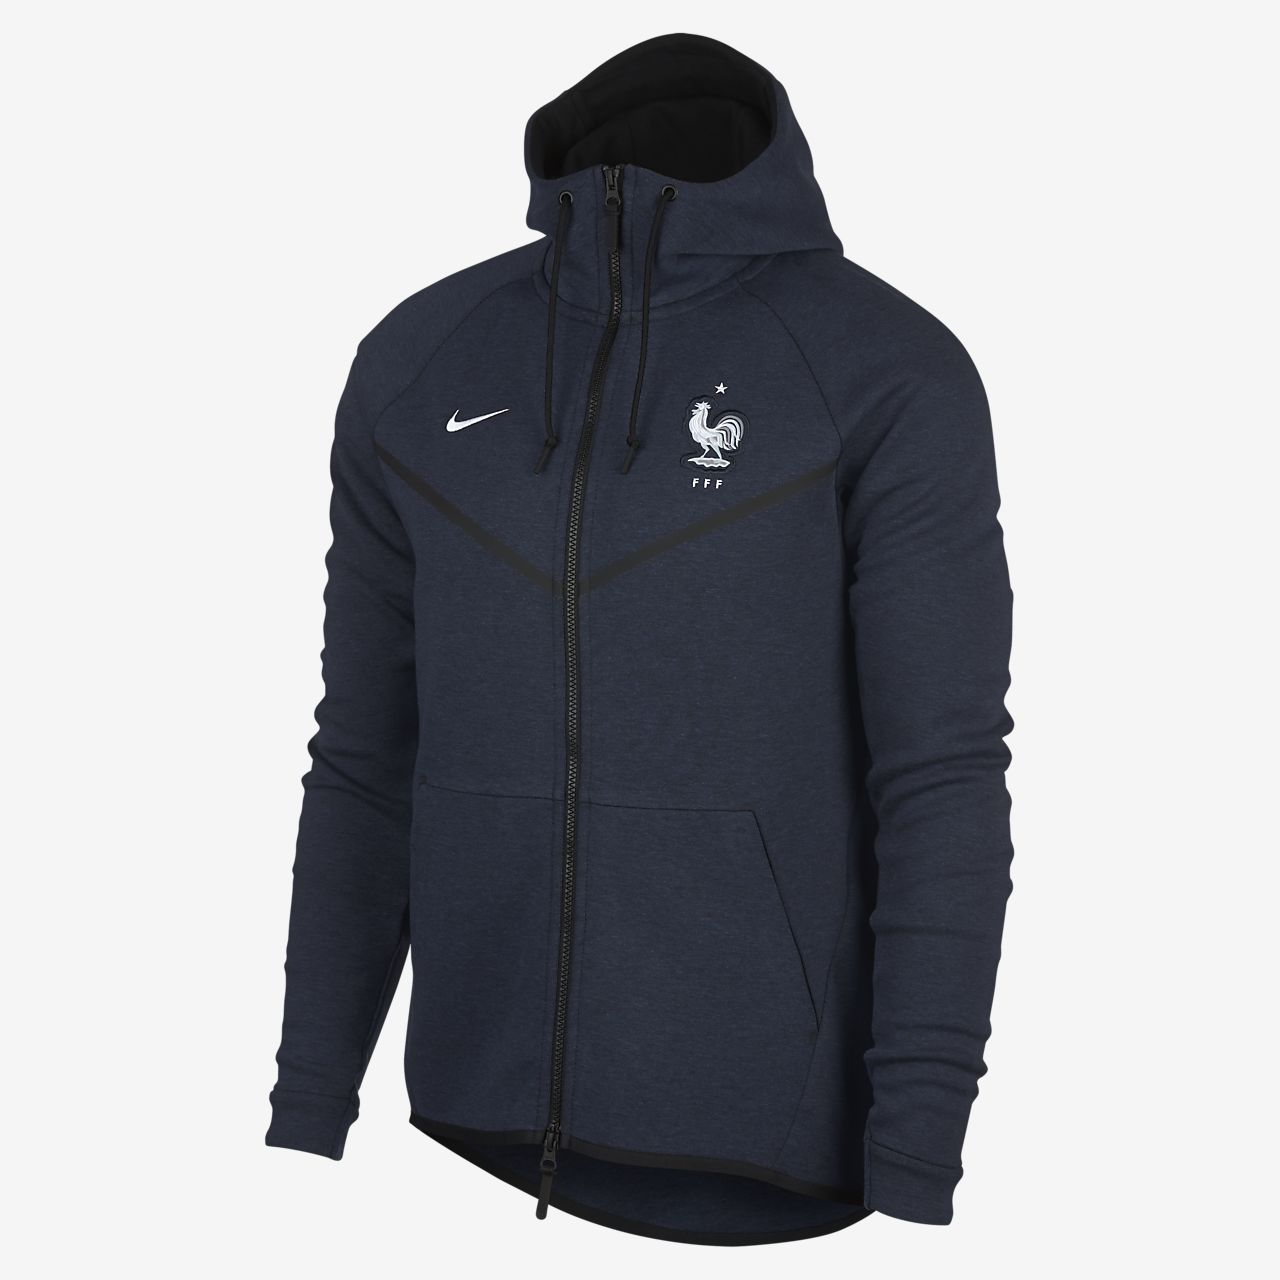 FFF Tech Fleece Windrunner Men's Jacket